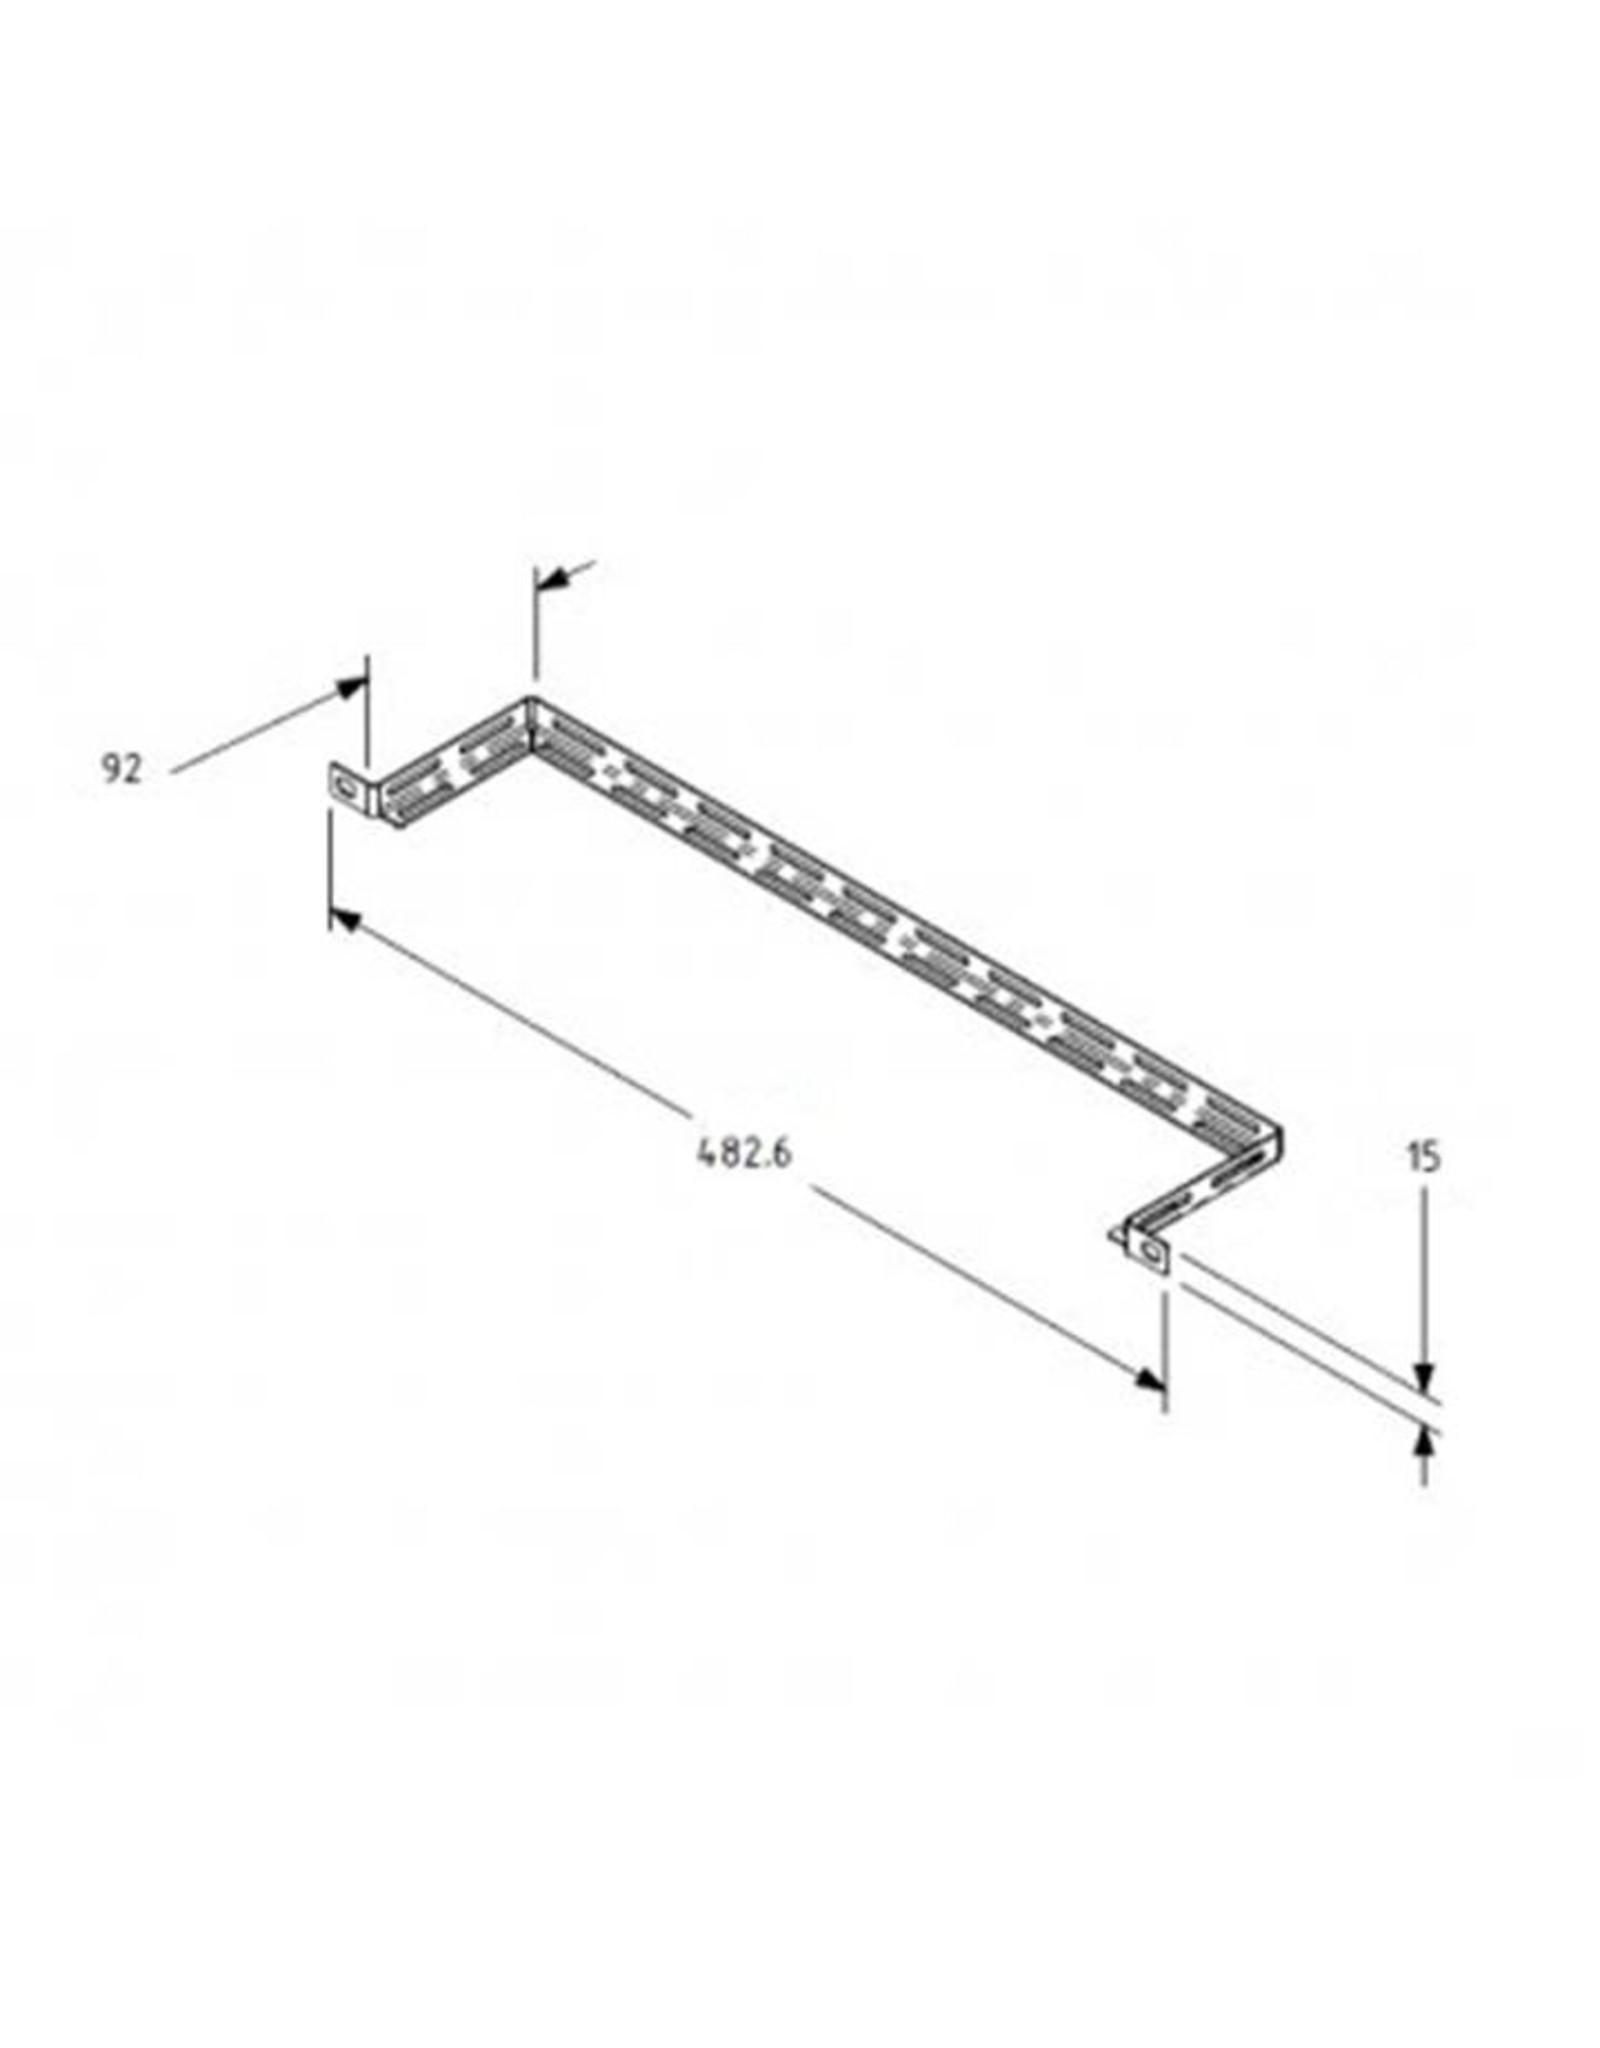 Penn Elcom Penn Elcom 19 inch rack mount cable support tie-bar, 92 mm